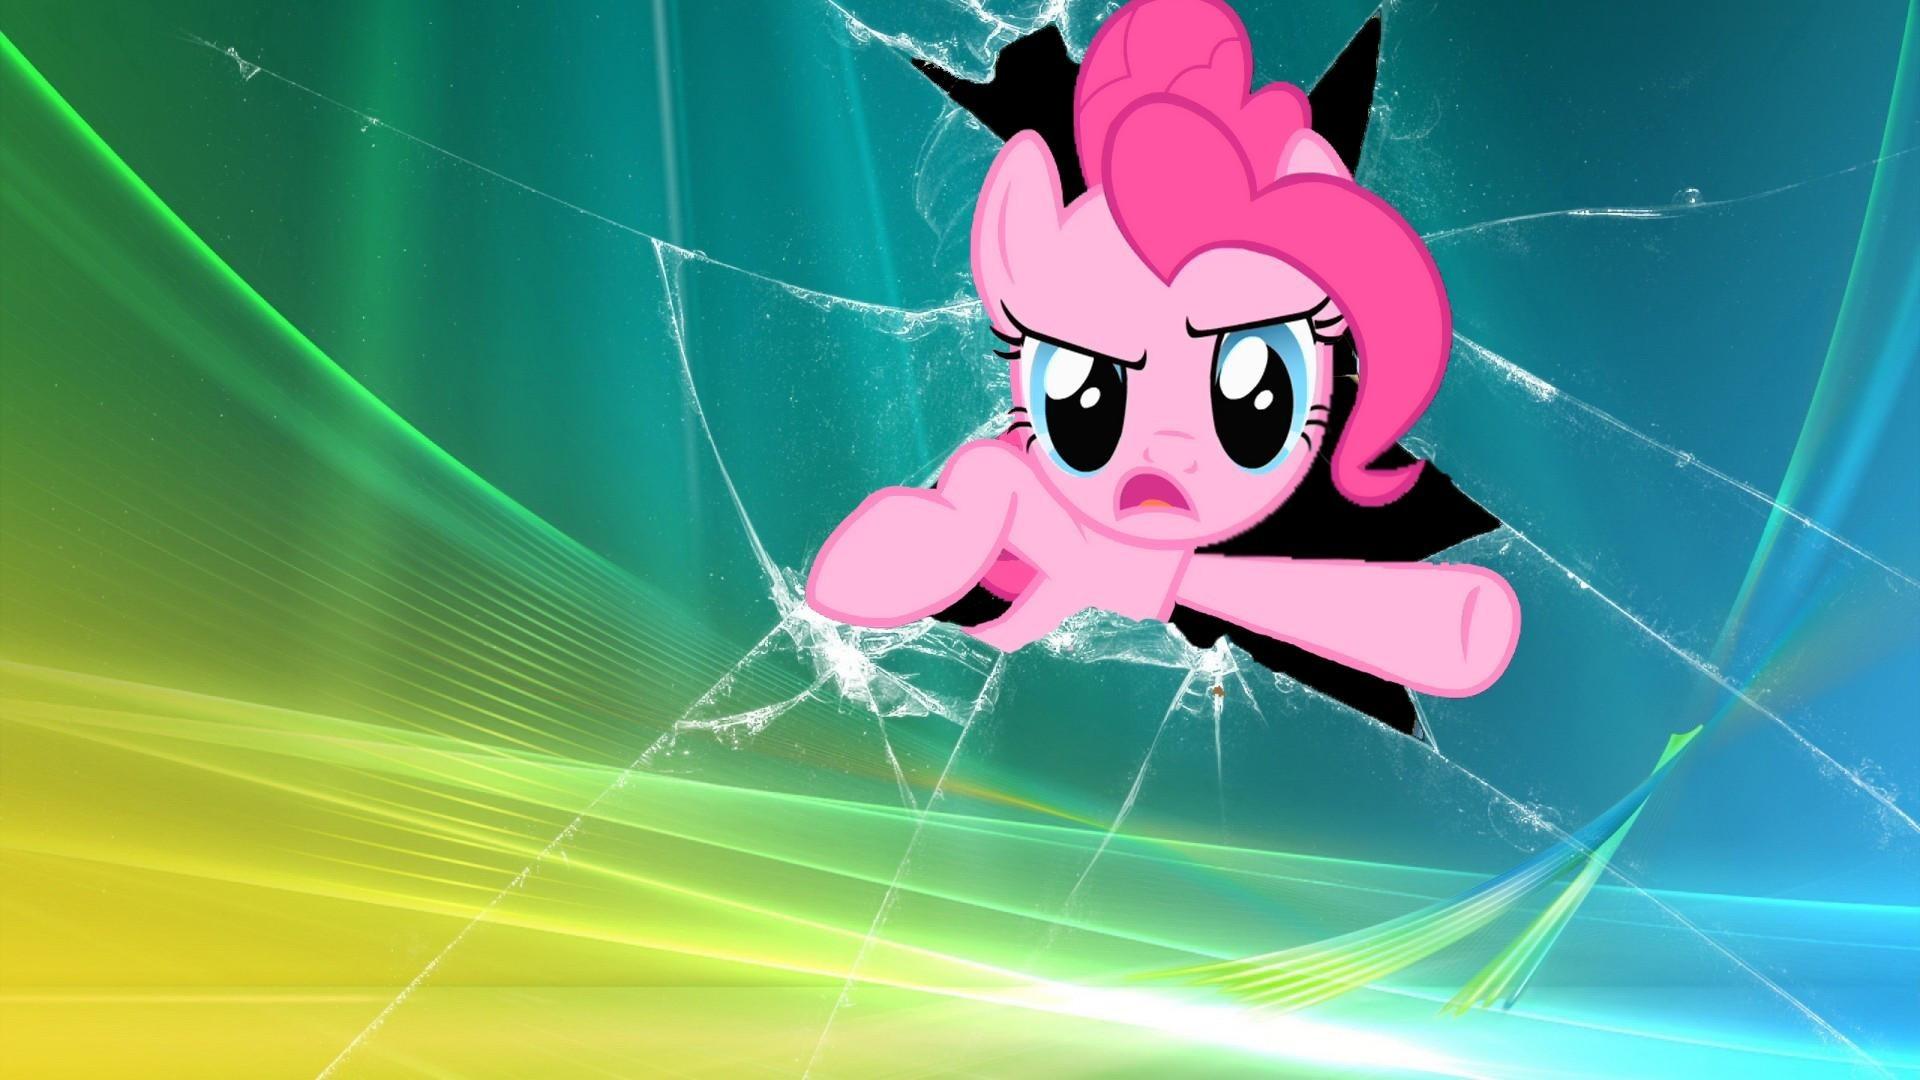 My Little Pony Friendship Is Magic HD Wallpapers | HD Wallpapers |  Pinterest | Hd wallpaper, Wallpaper and Wallpaper desktop